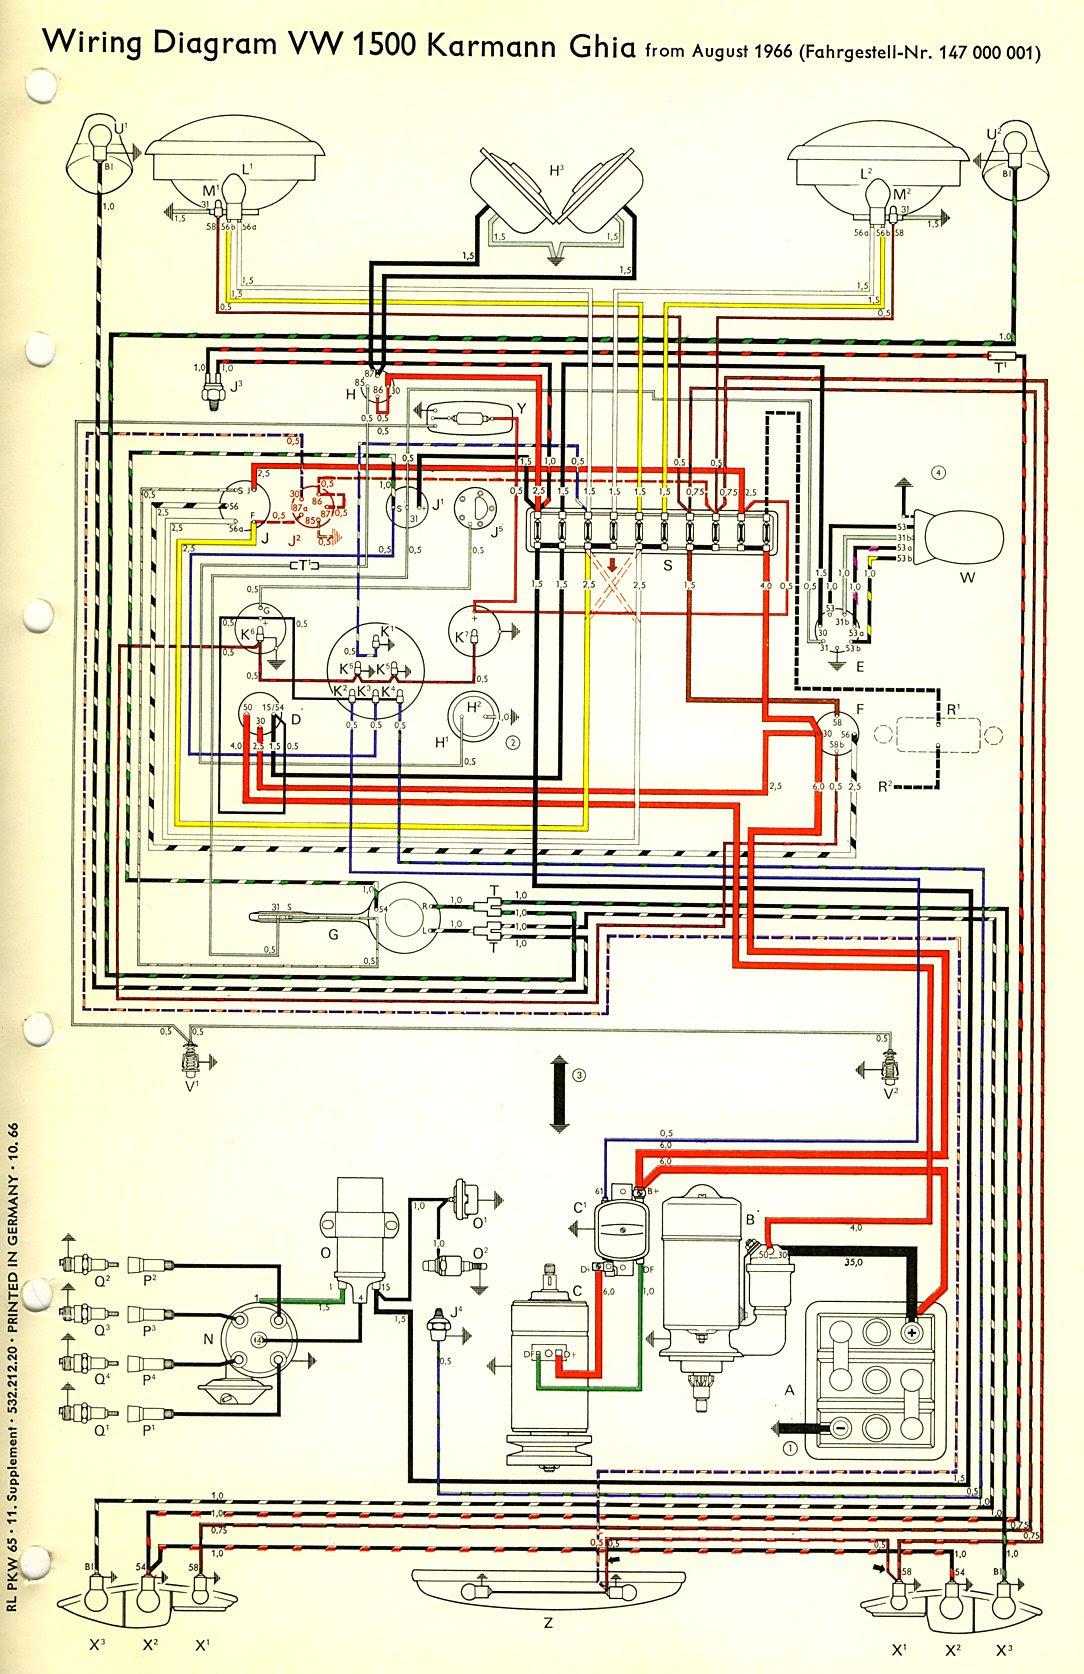 Diagram Tachometer Wiring Diagram 1n4001 Full Version Hd Quality Diagram 1n4001 Diagramm Discountdellapiastrella It